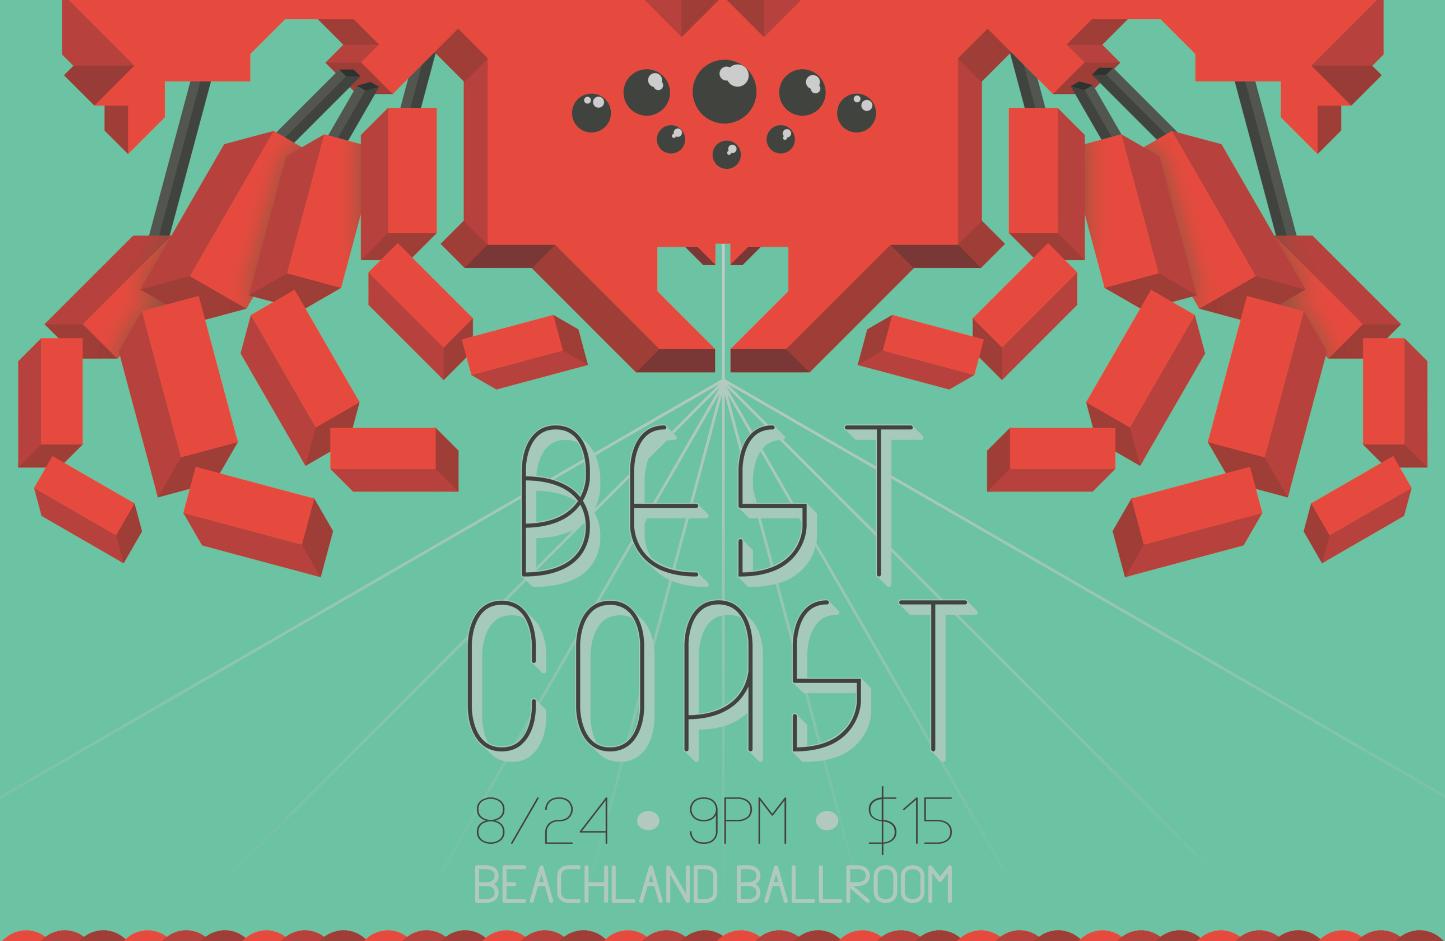 Best Coast.png